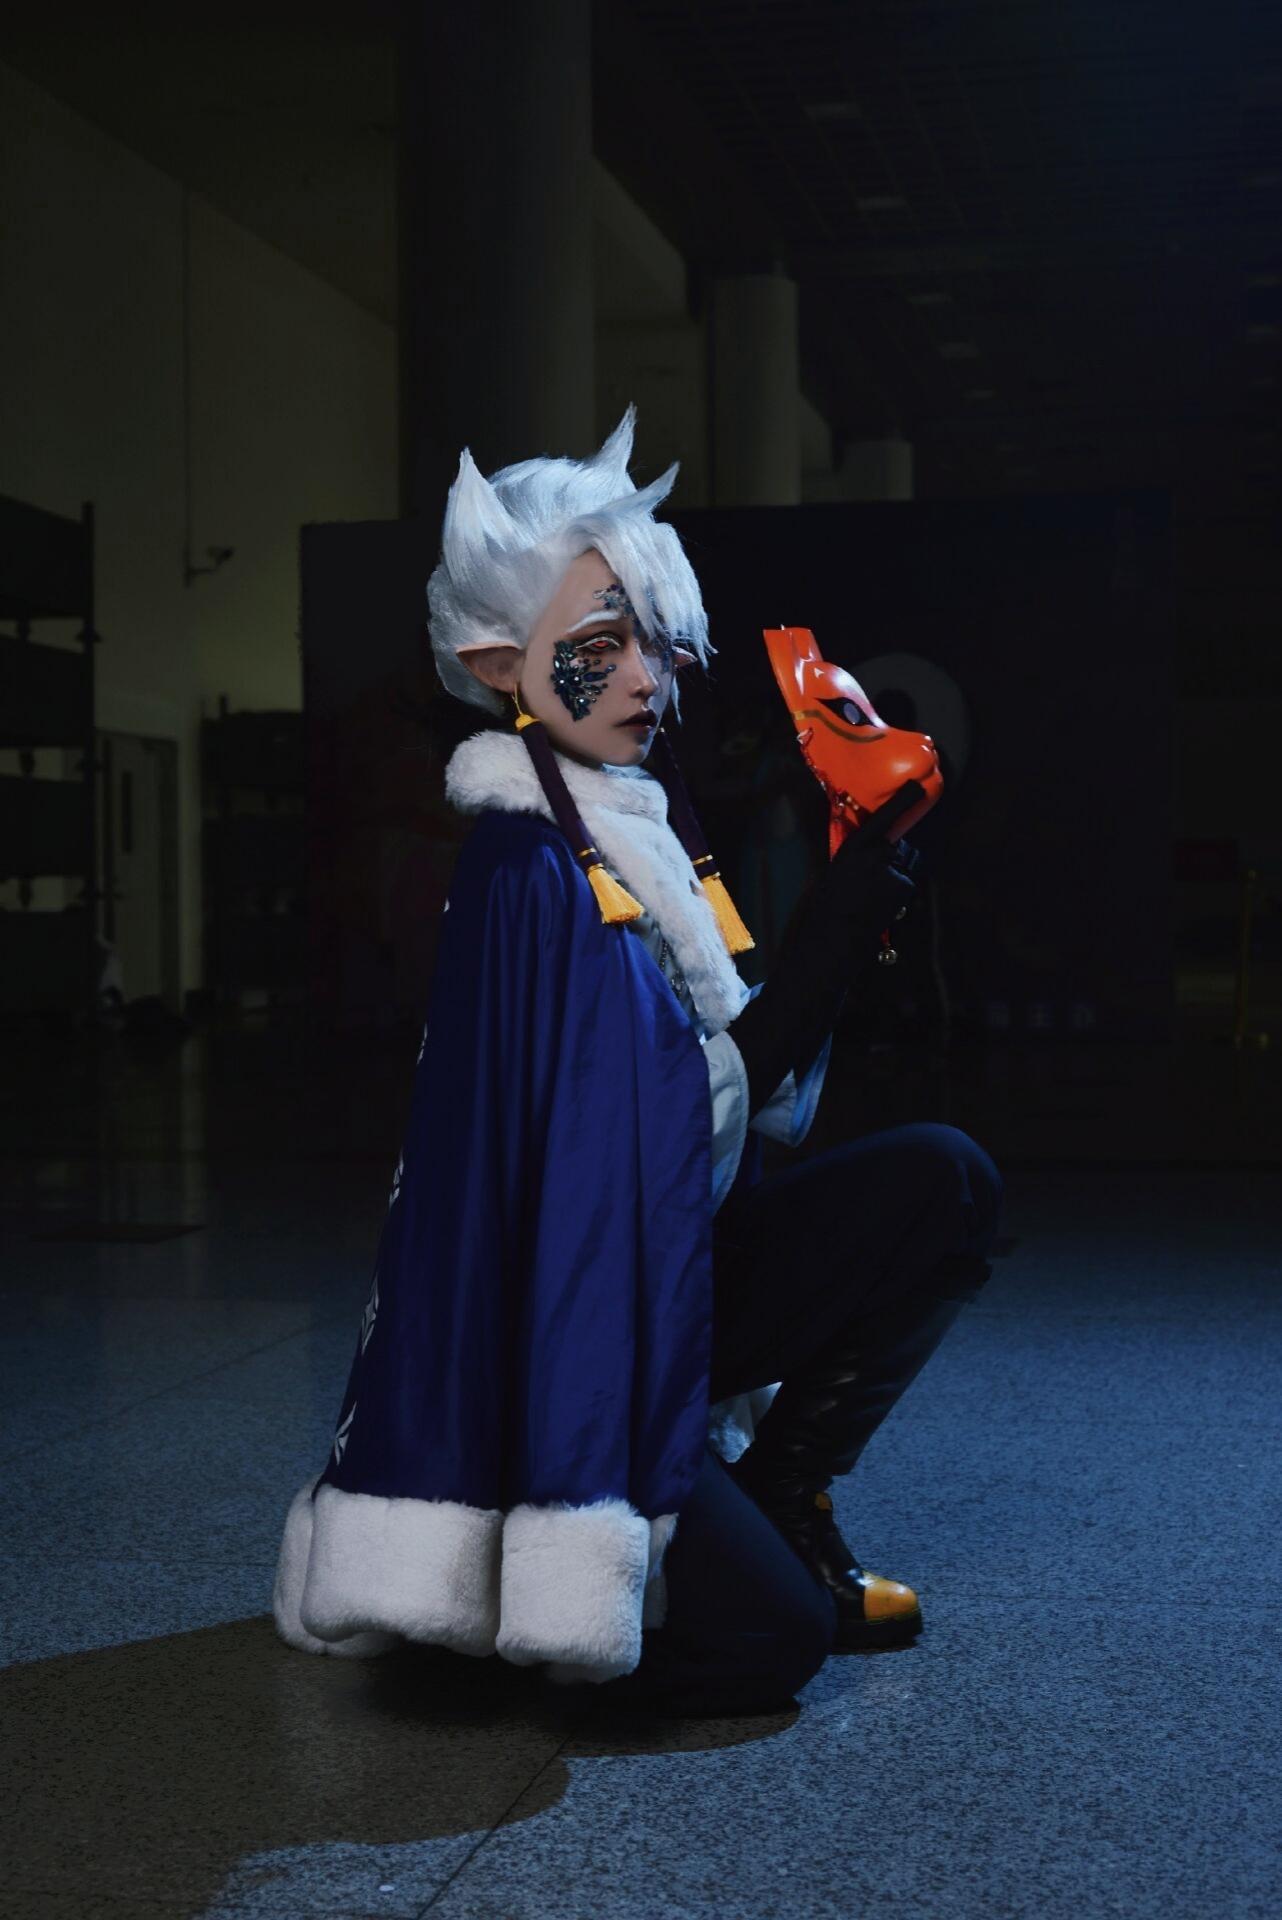 《SKY光遇》正片cosplay【CN:君祭酒】-第12张